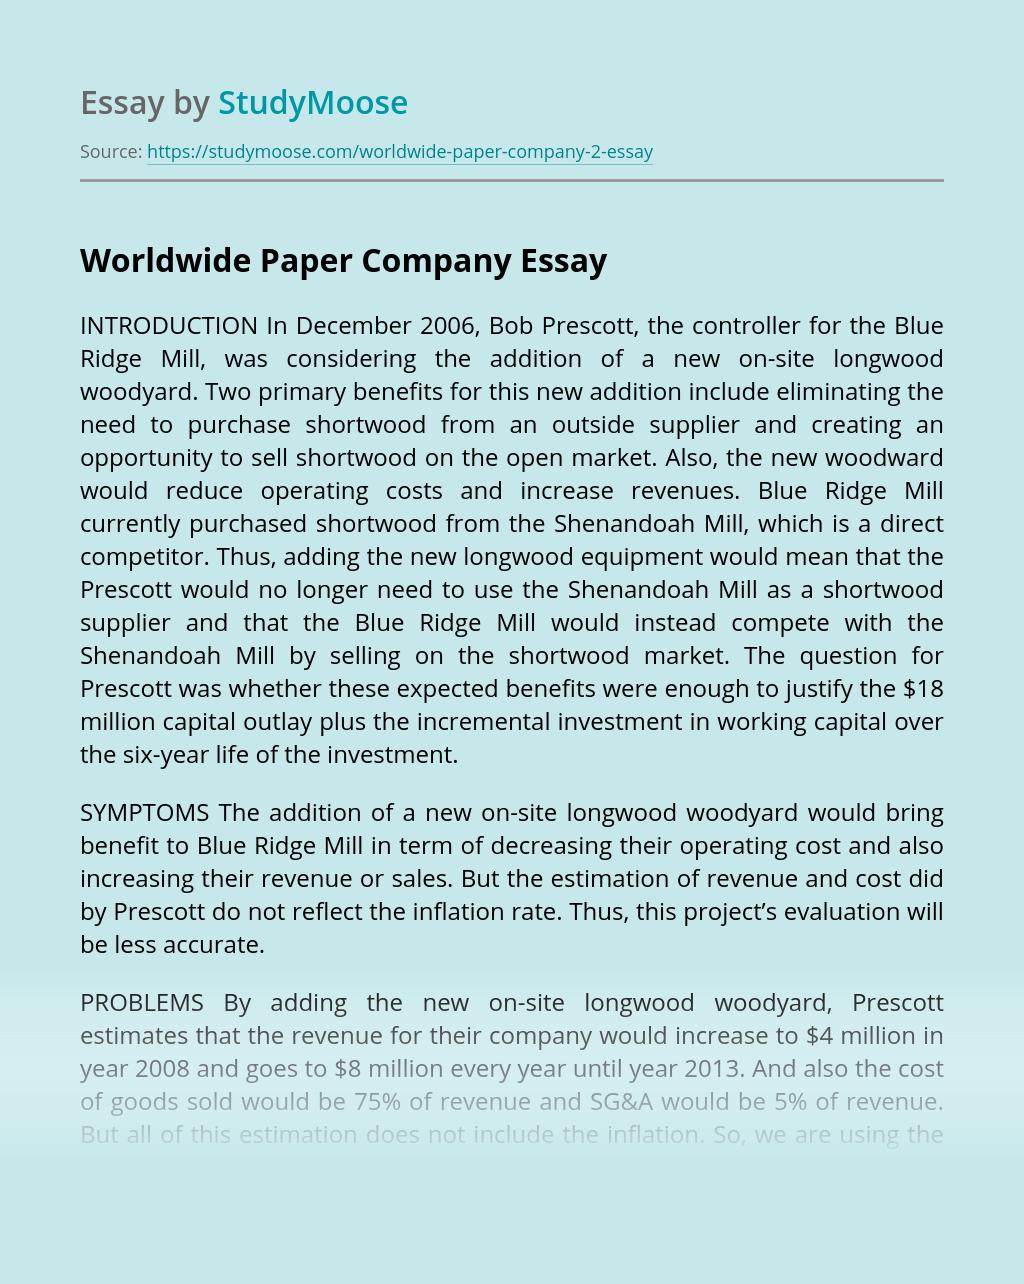 Worldwide Paper Company